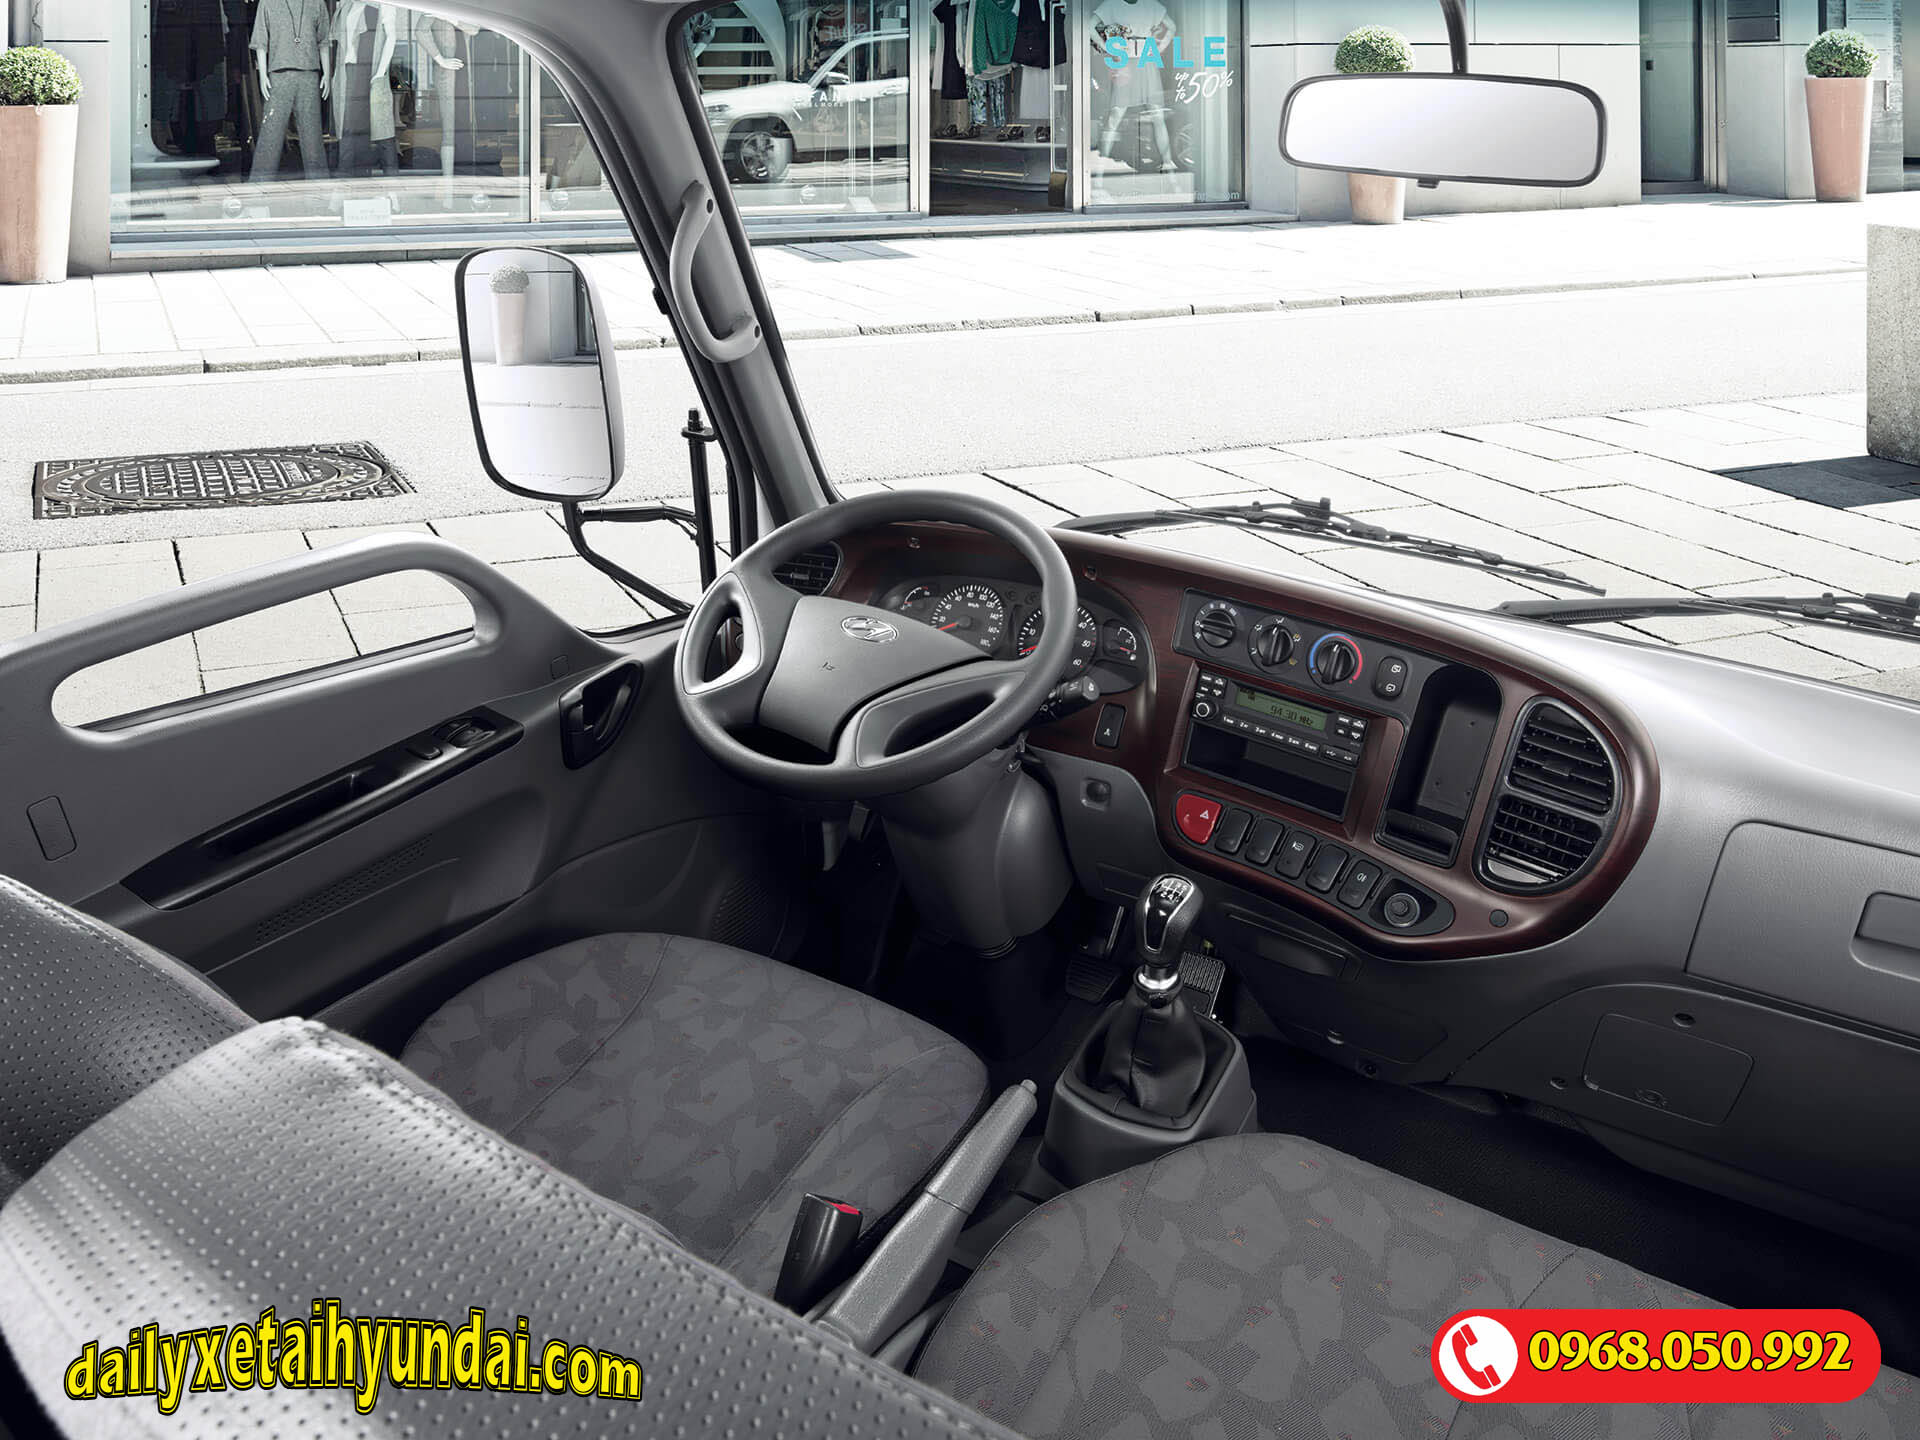 Nội thất Hyundai N250